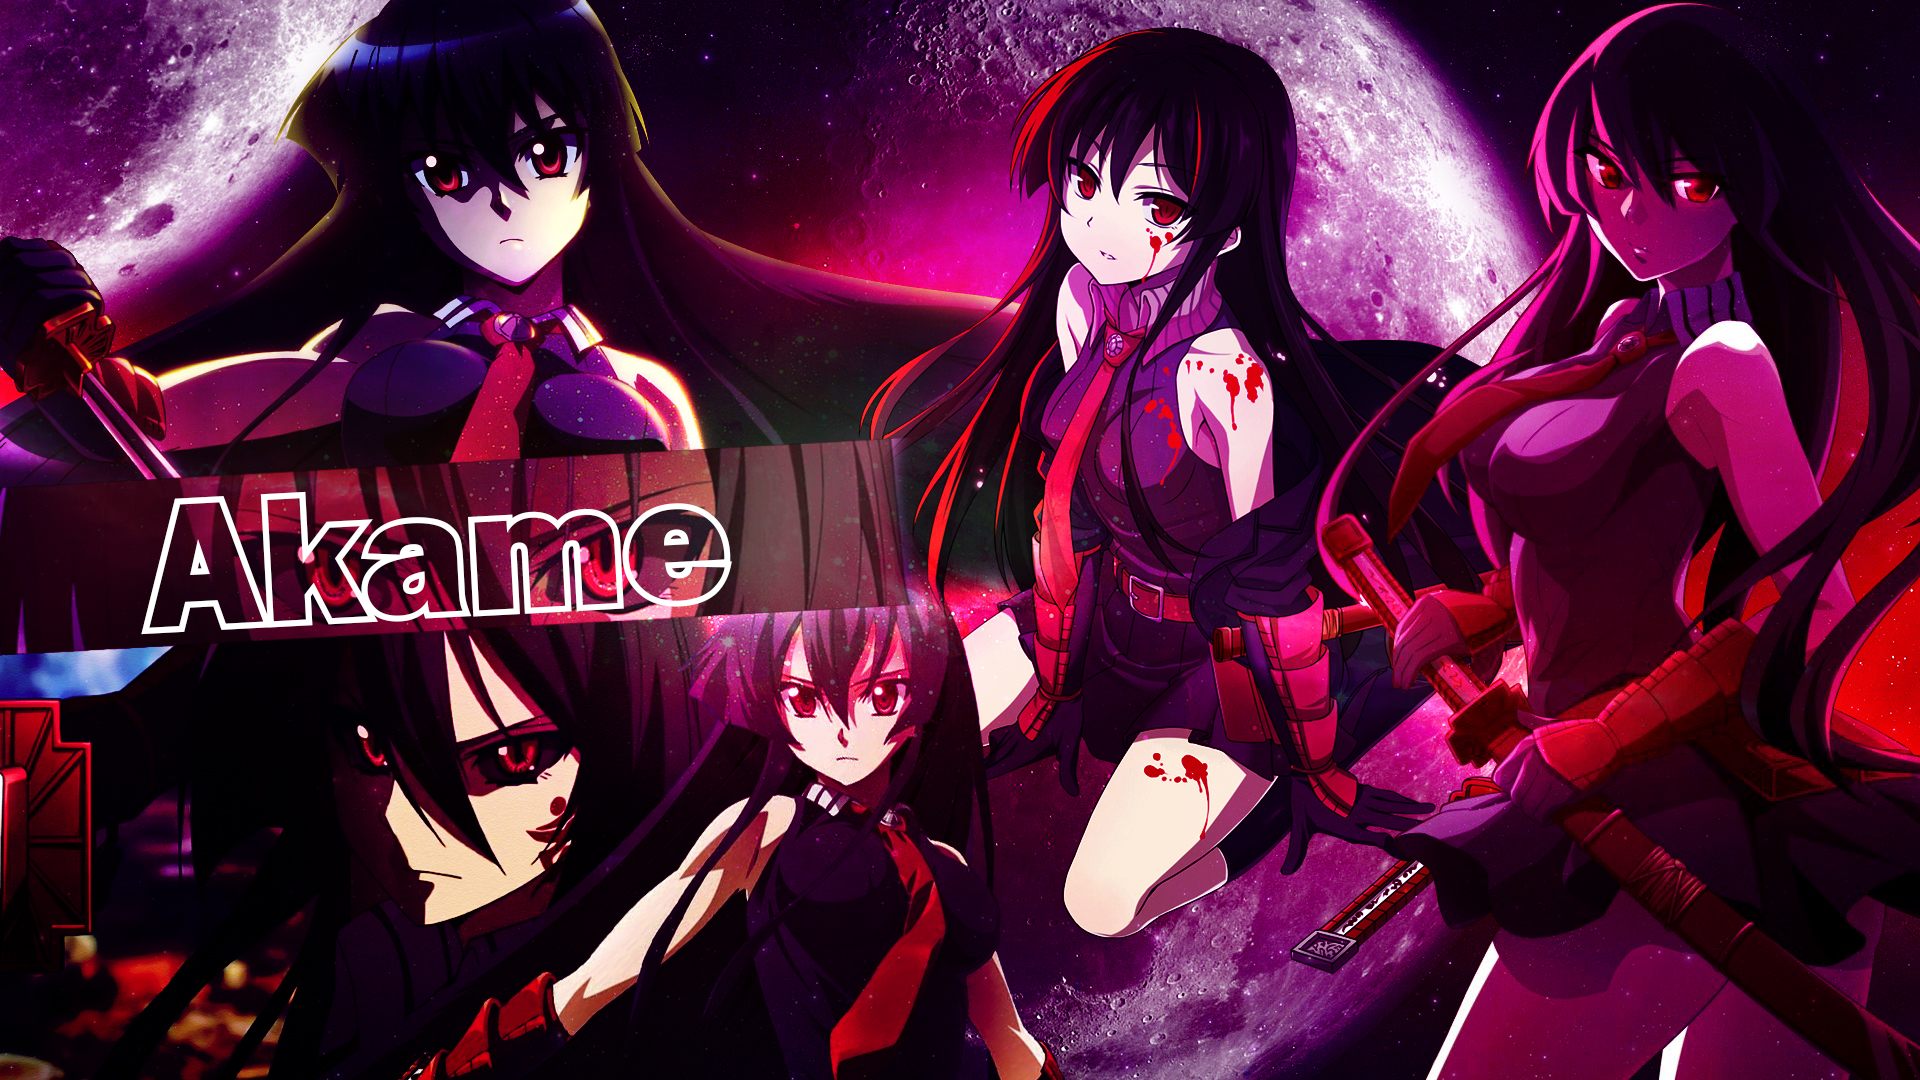 Akame ga Kill! HD Wallpaper   Background Image   1920x1080 ...